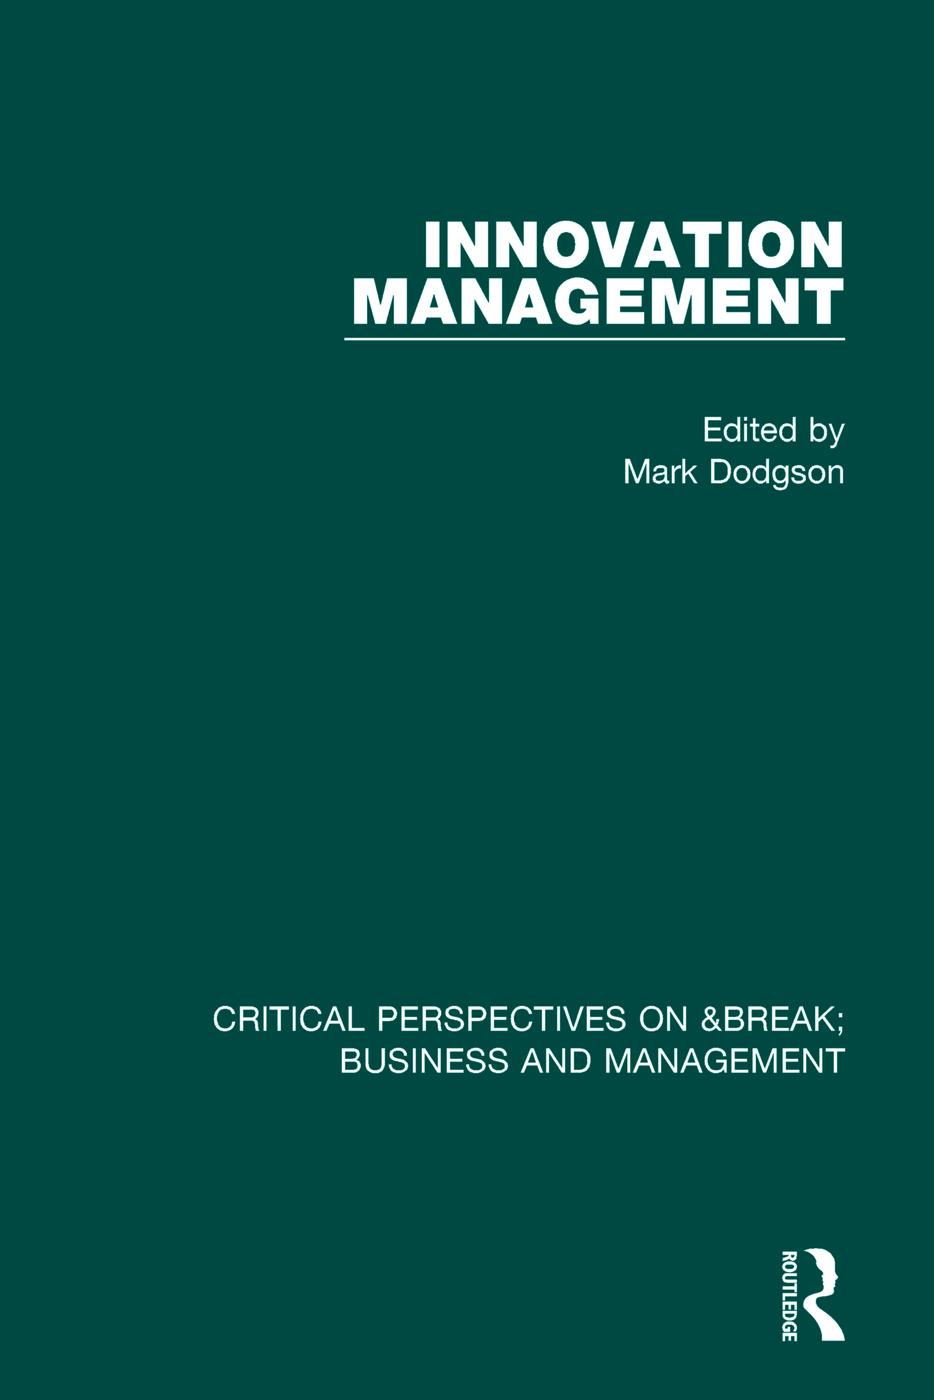 Innovation Management vol I book cover